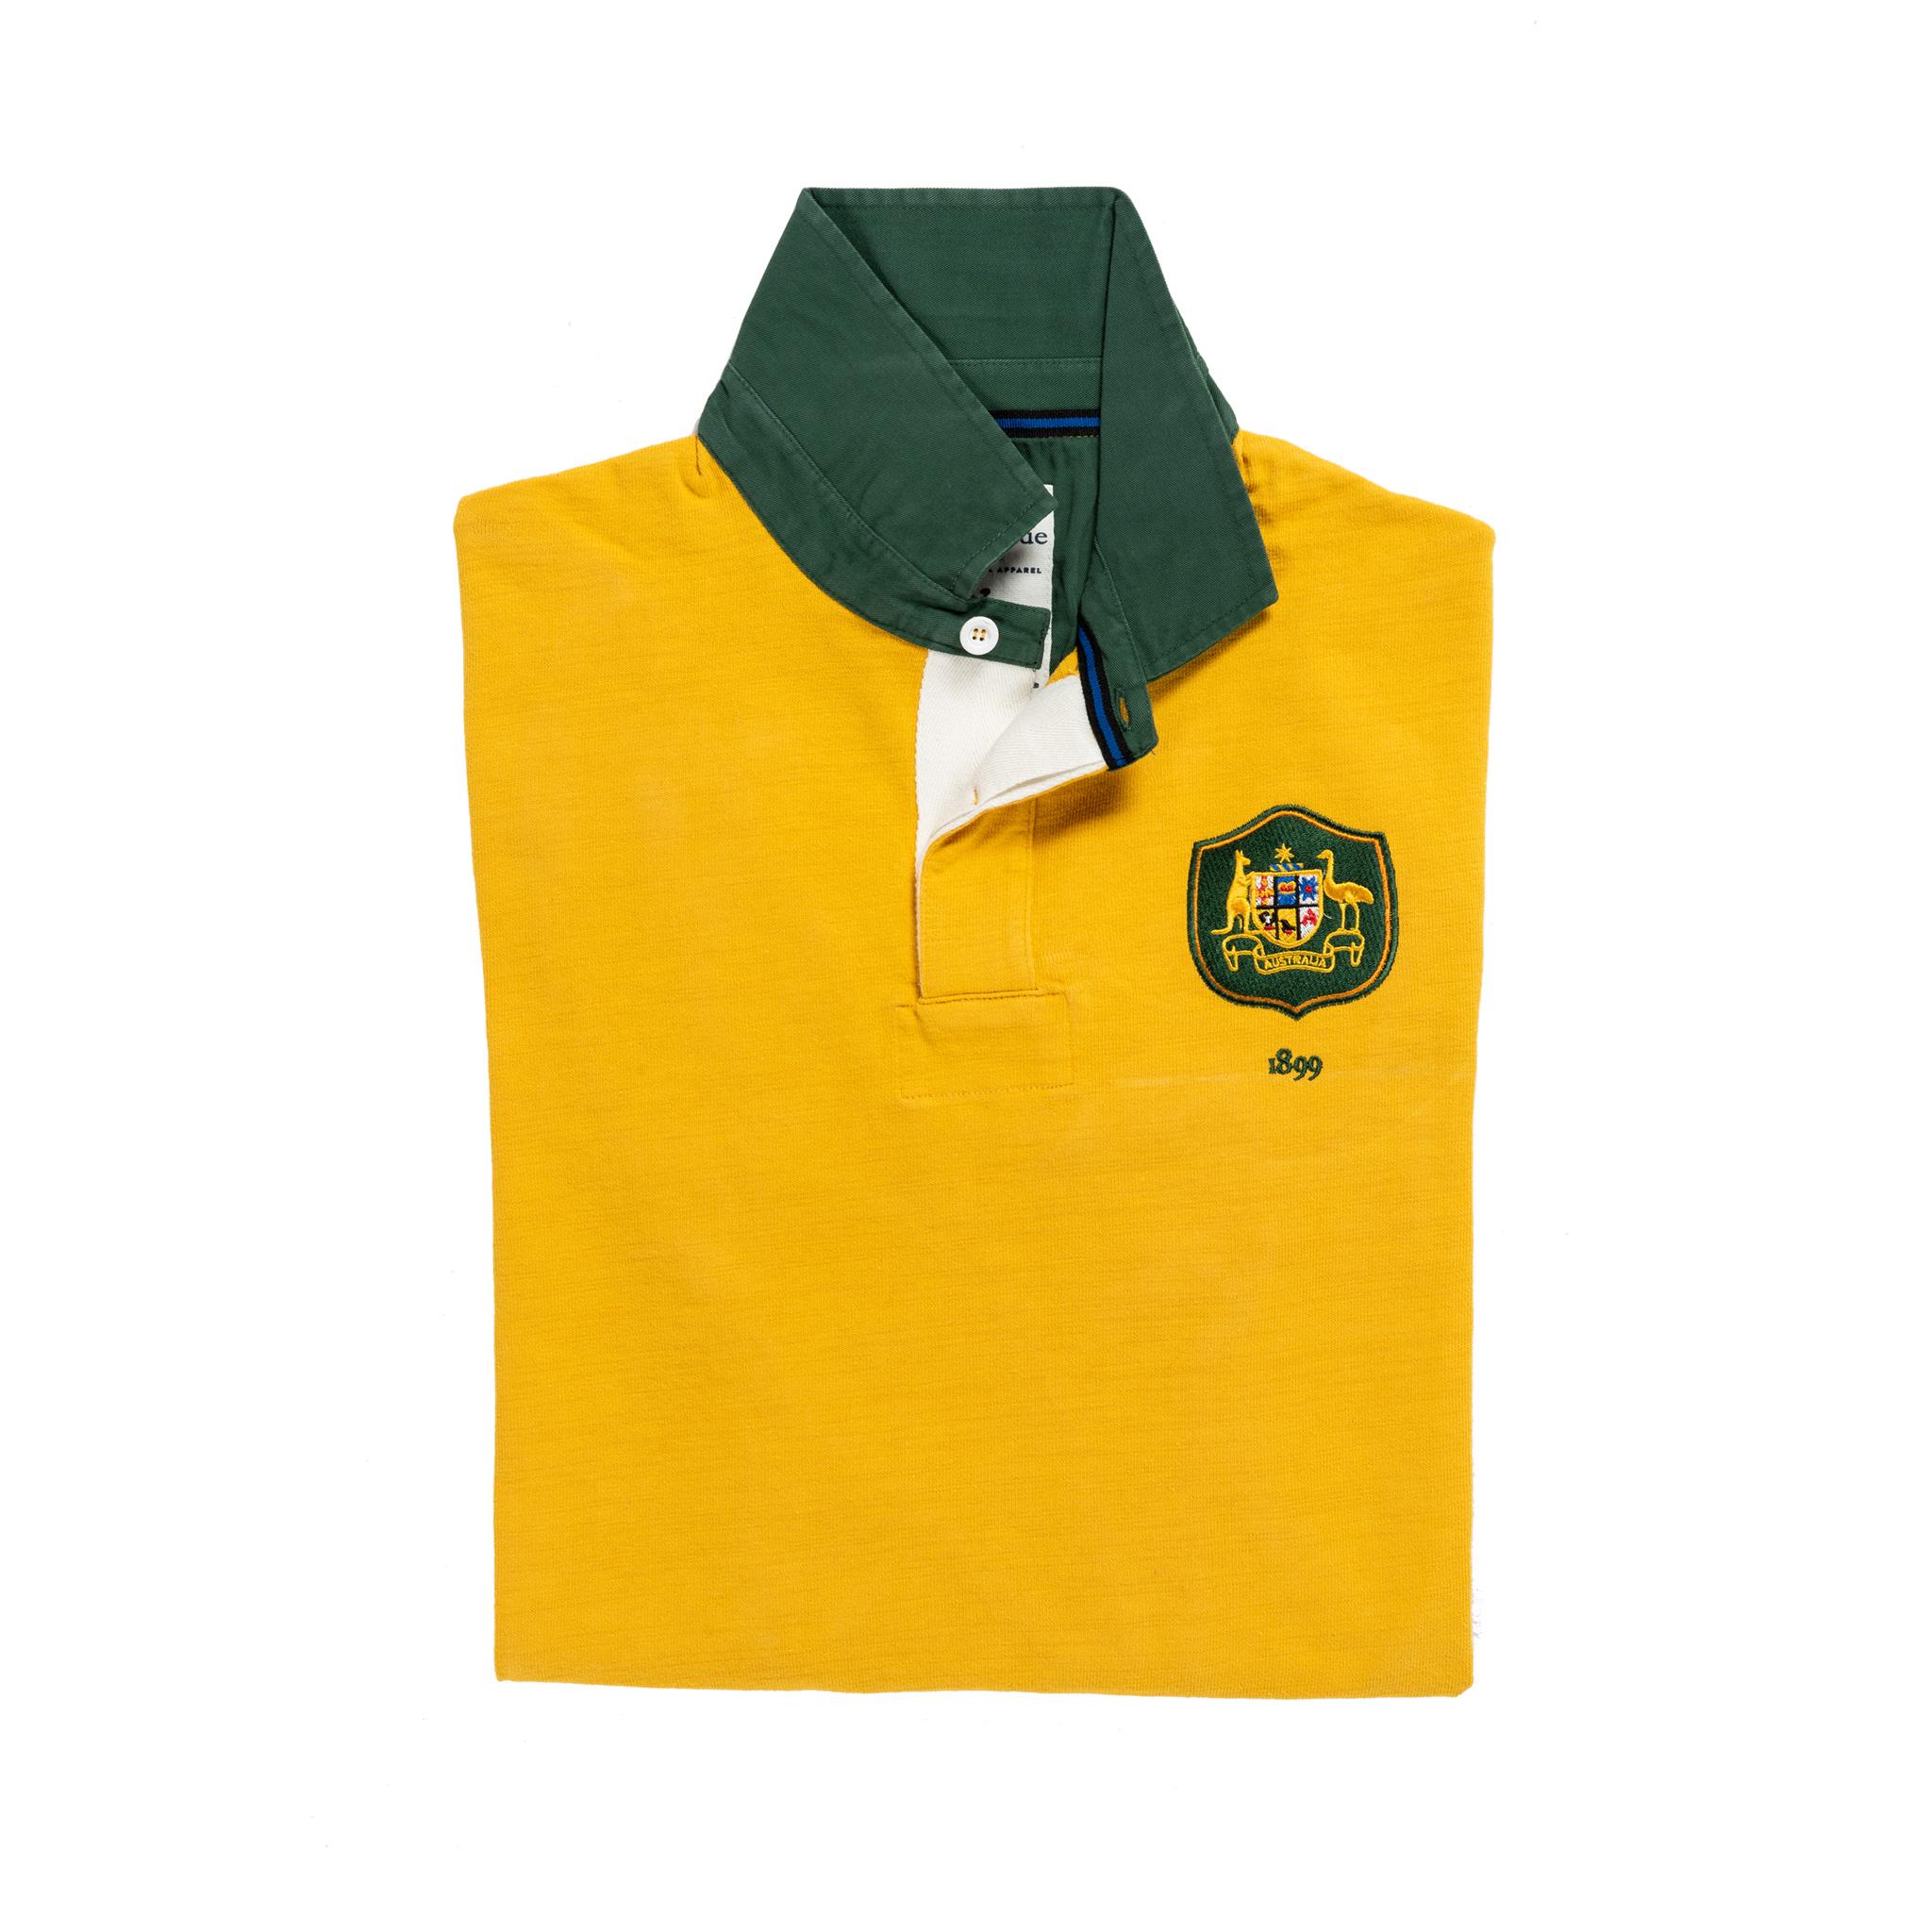 Australia 1899 Vintage Rugby Shirt